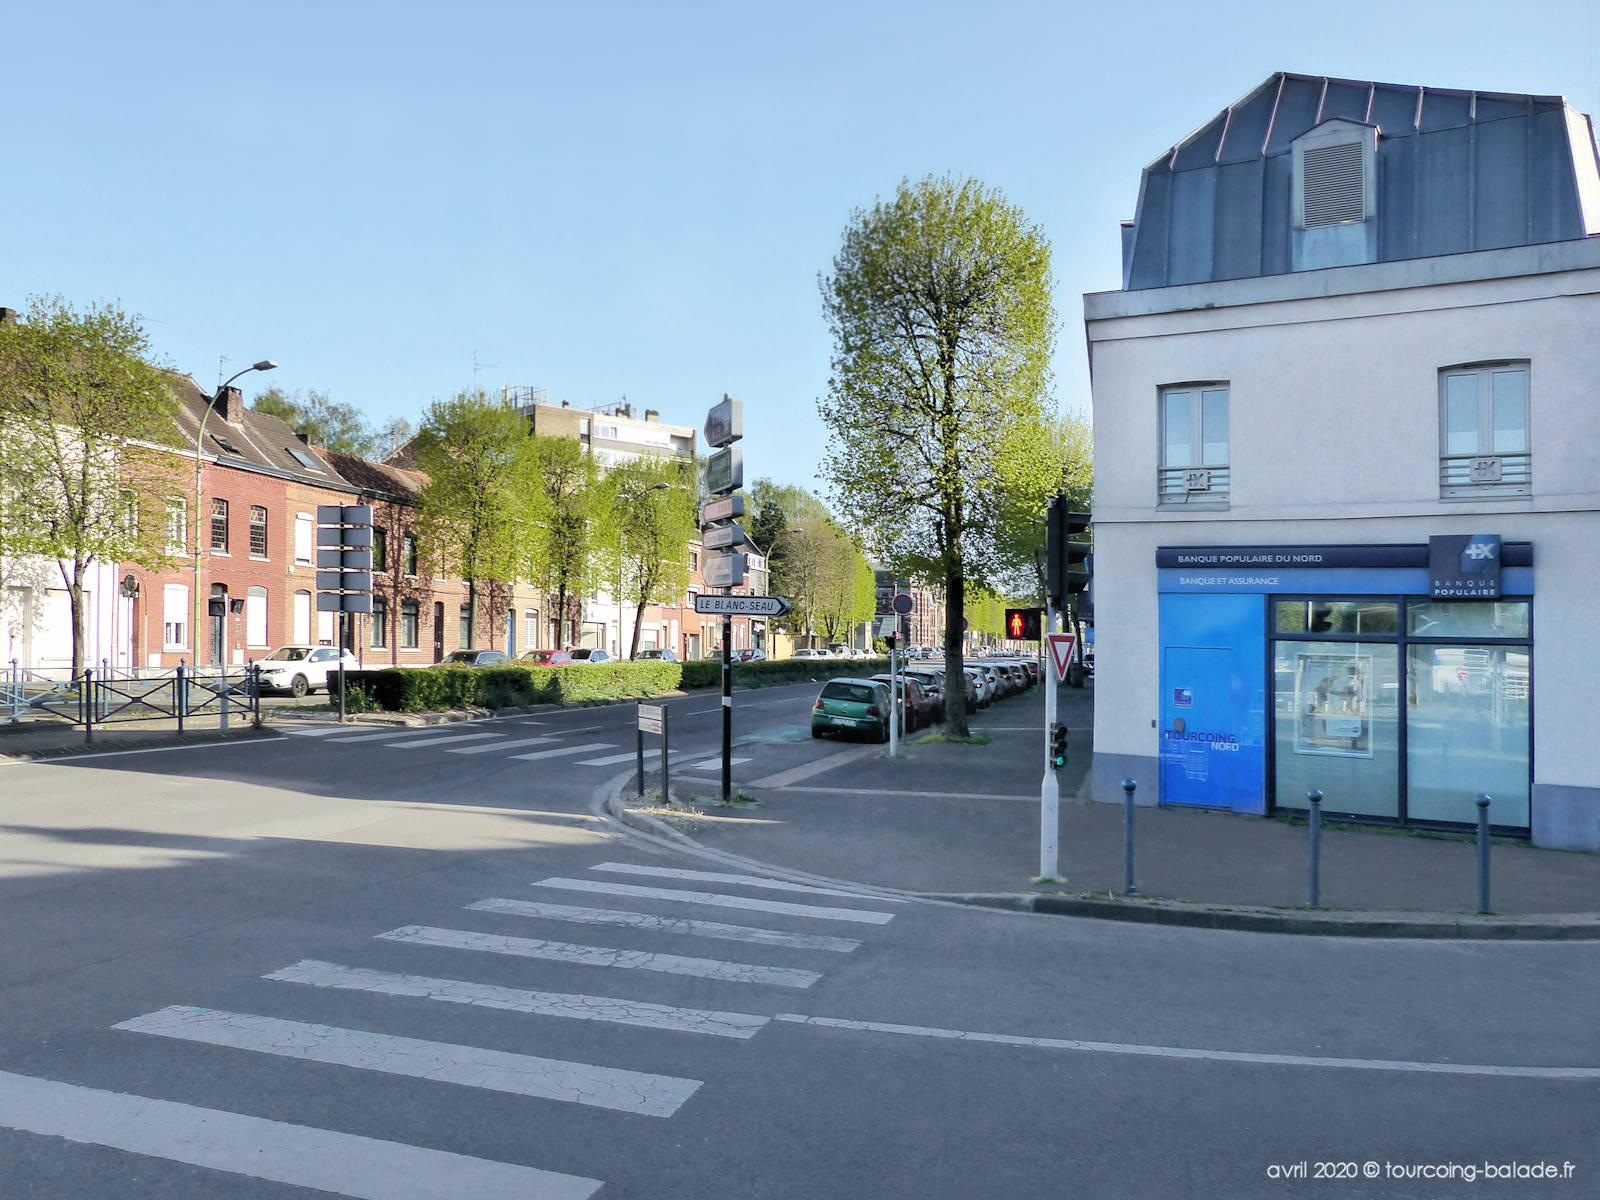 Boulevard Gambetta Tourcoing - Banque populaire du Nord